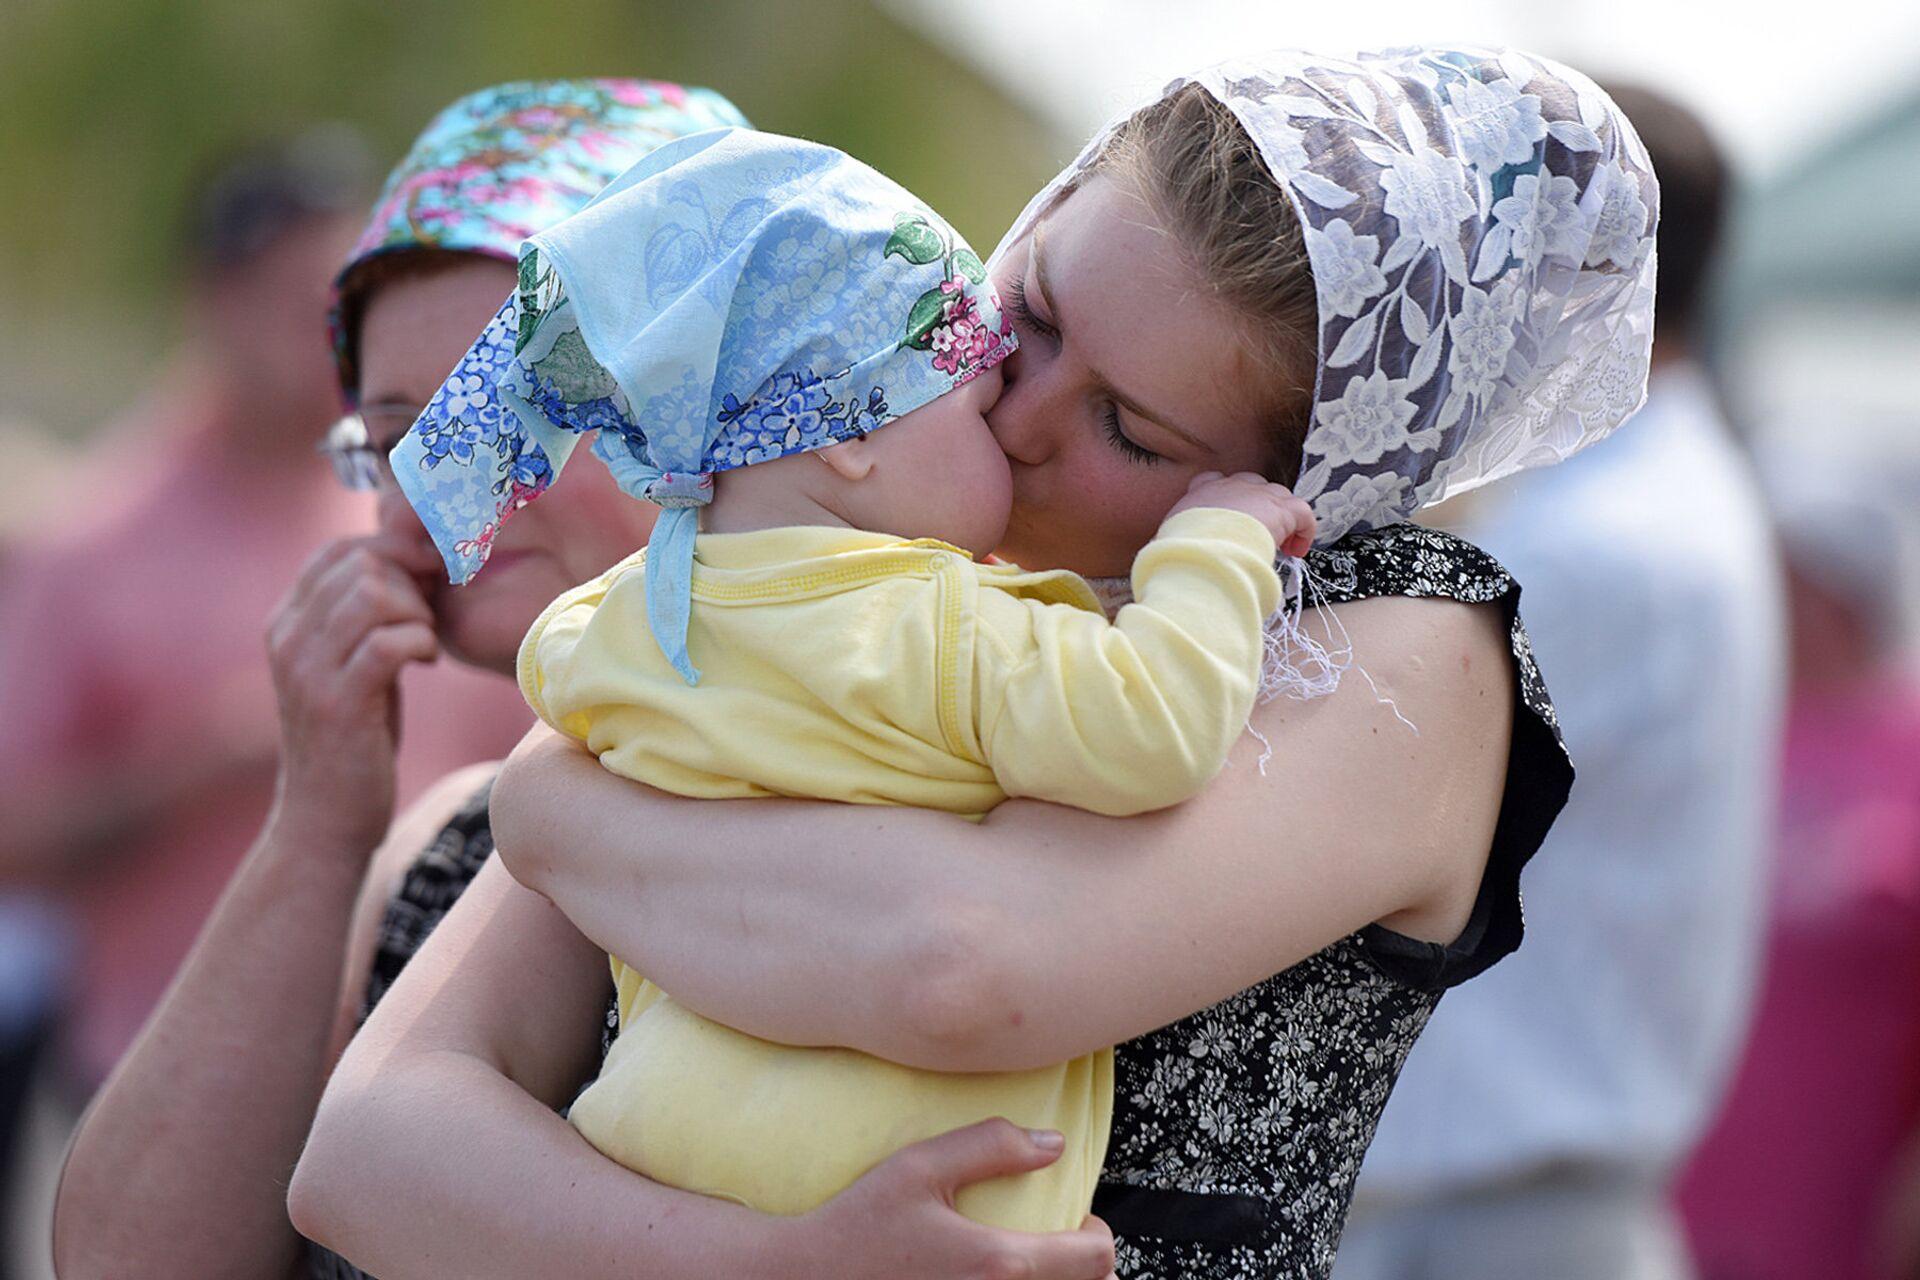 Мама с ребенком, архивное фото - Sputnik Беларусь, 1920, 11.10.2021